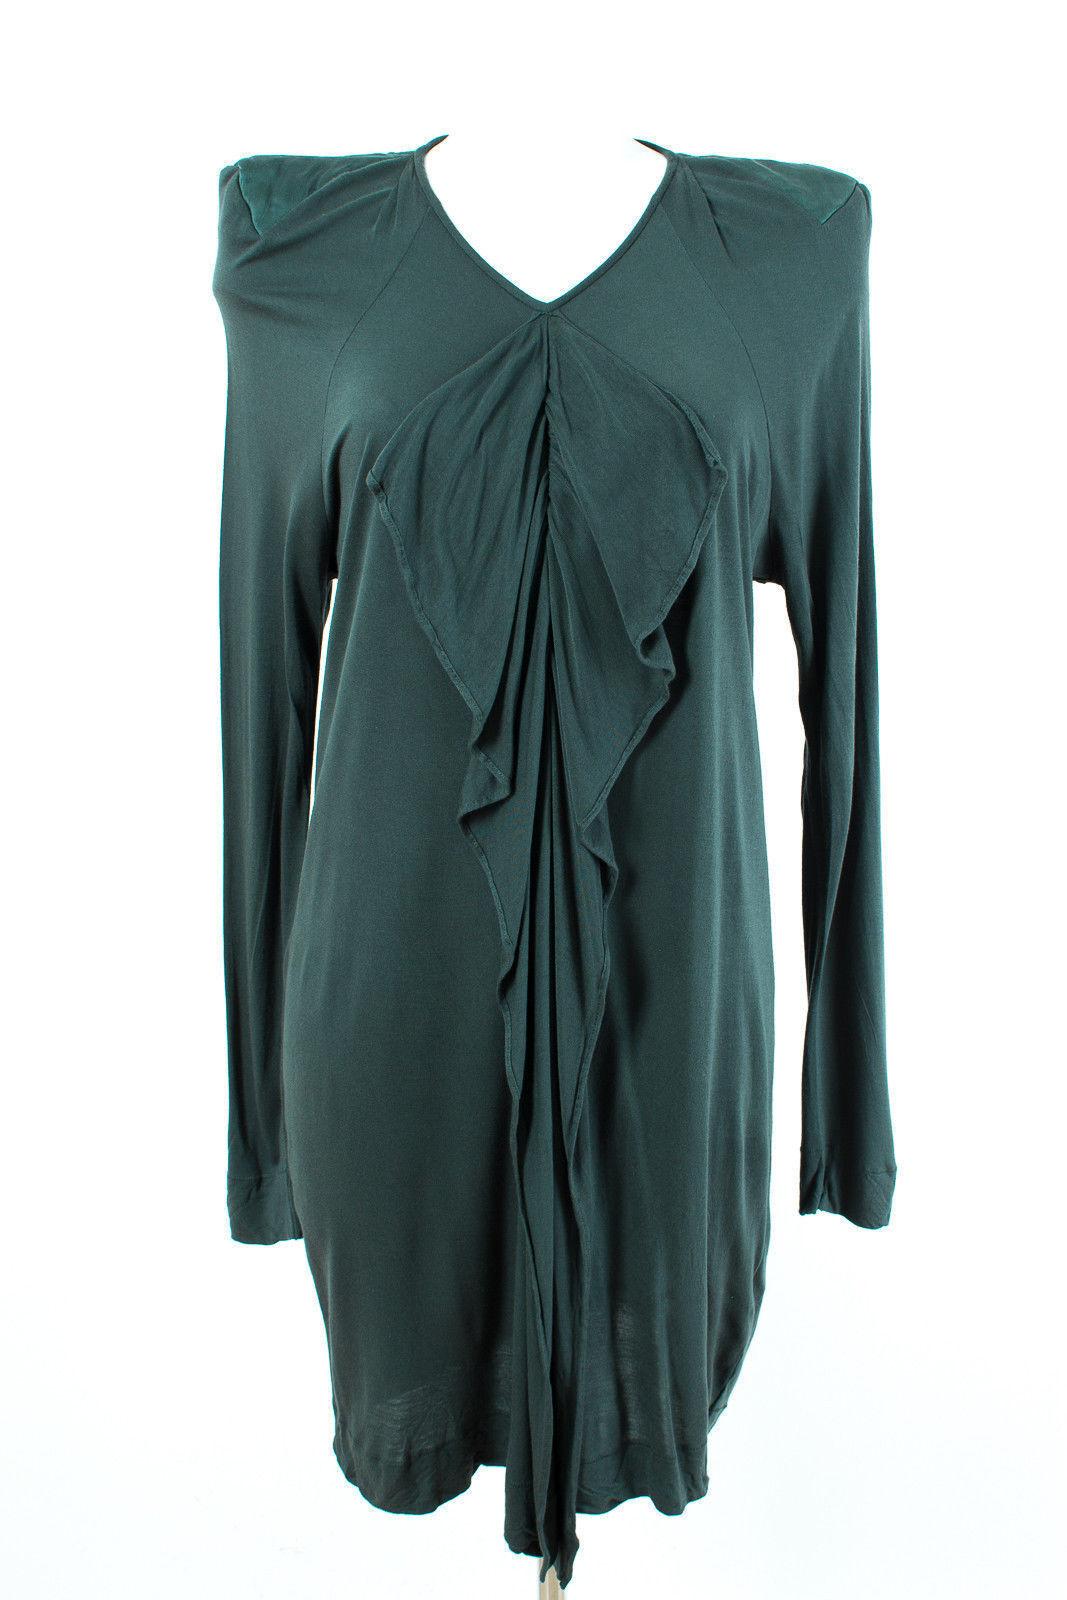 Malene Birger vestido talla L 40 camisa vestido stretch stretch stretch Jersey dress robe b7206a